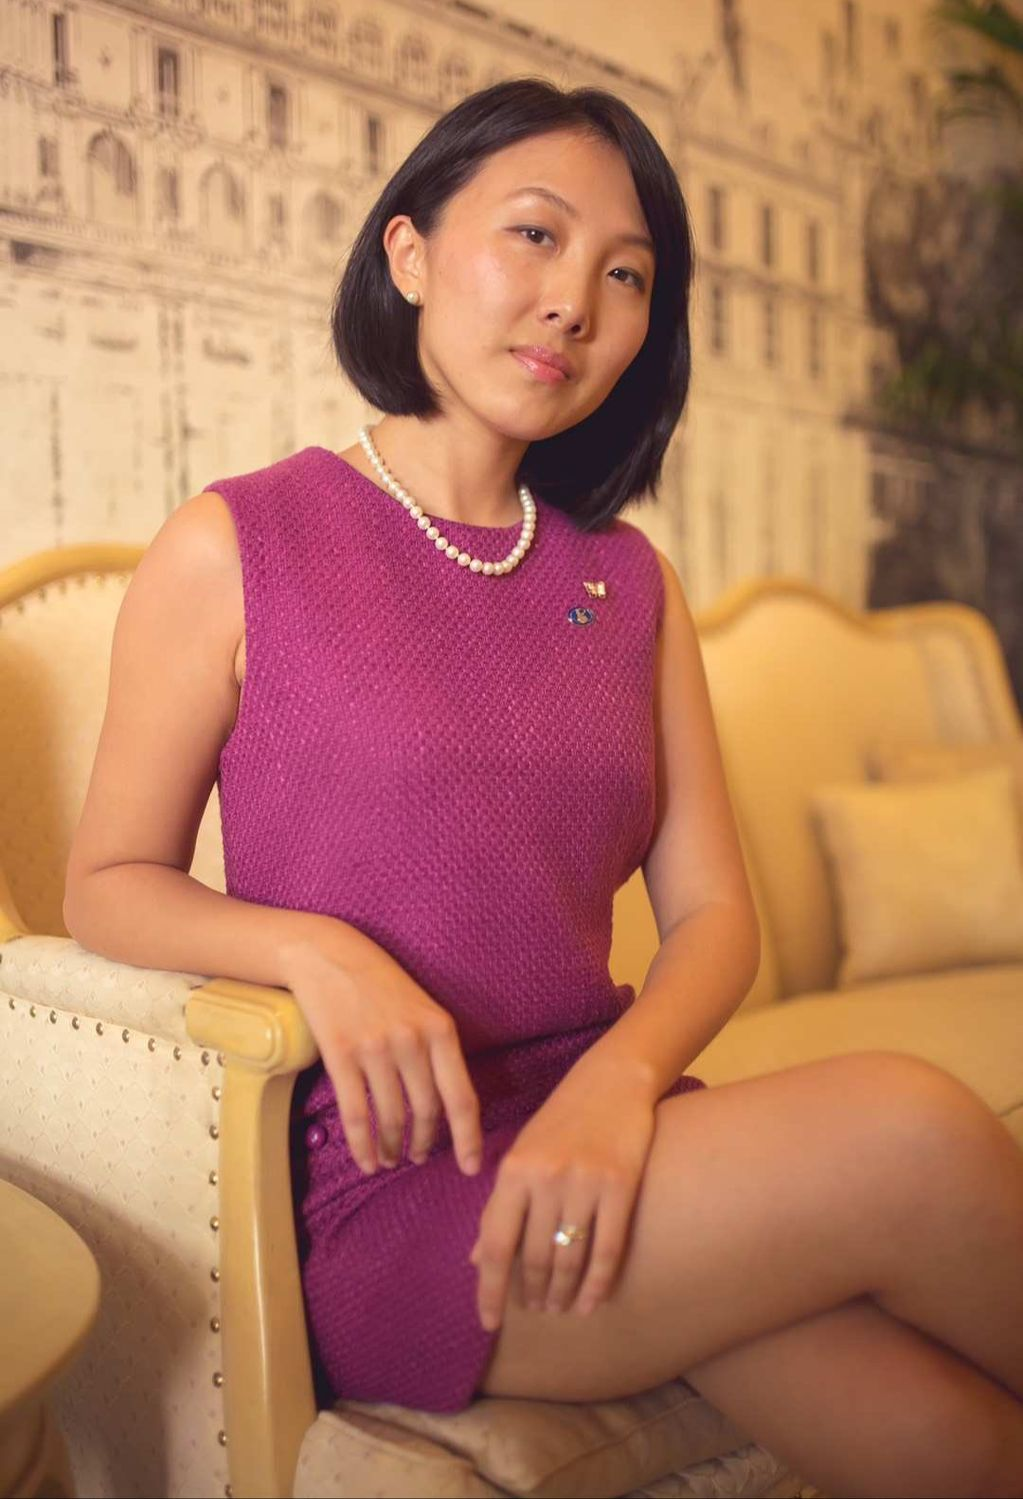 Purple Gao  head sommelier Resorts World Sentosa - THE EDGE SINGAPORE